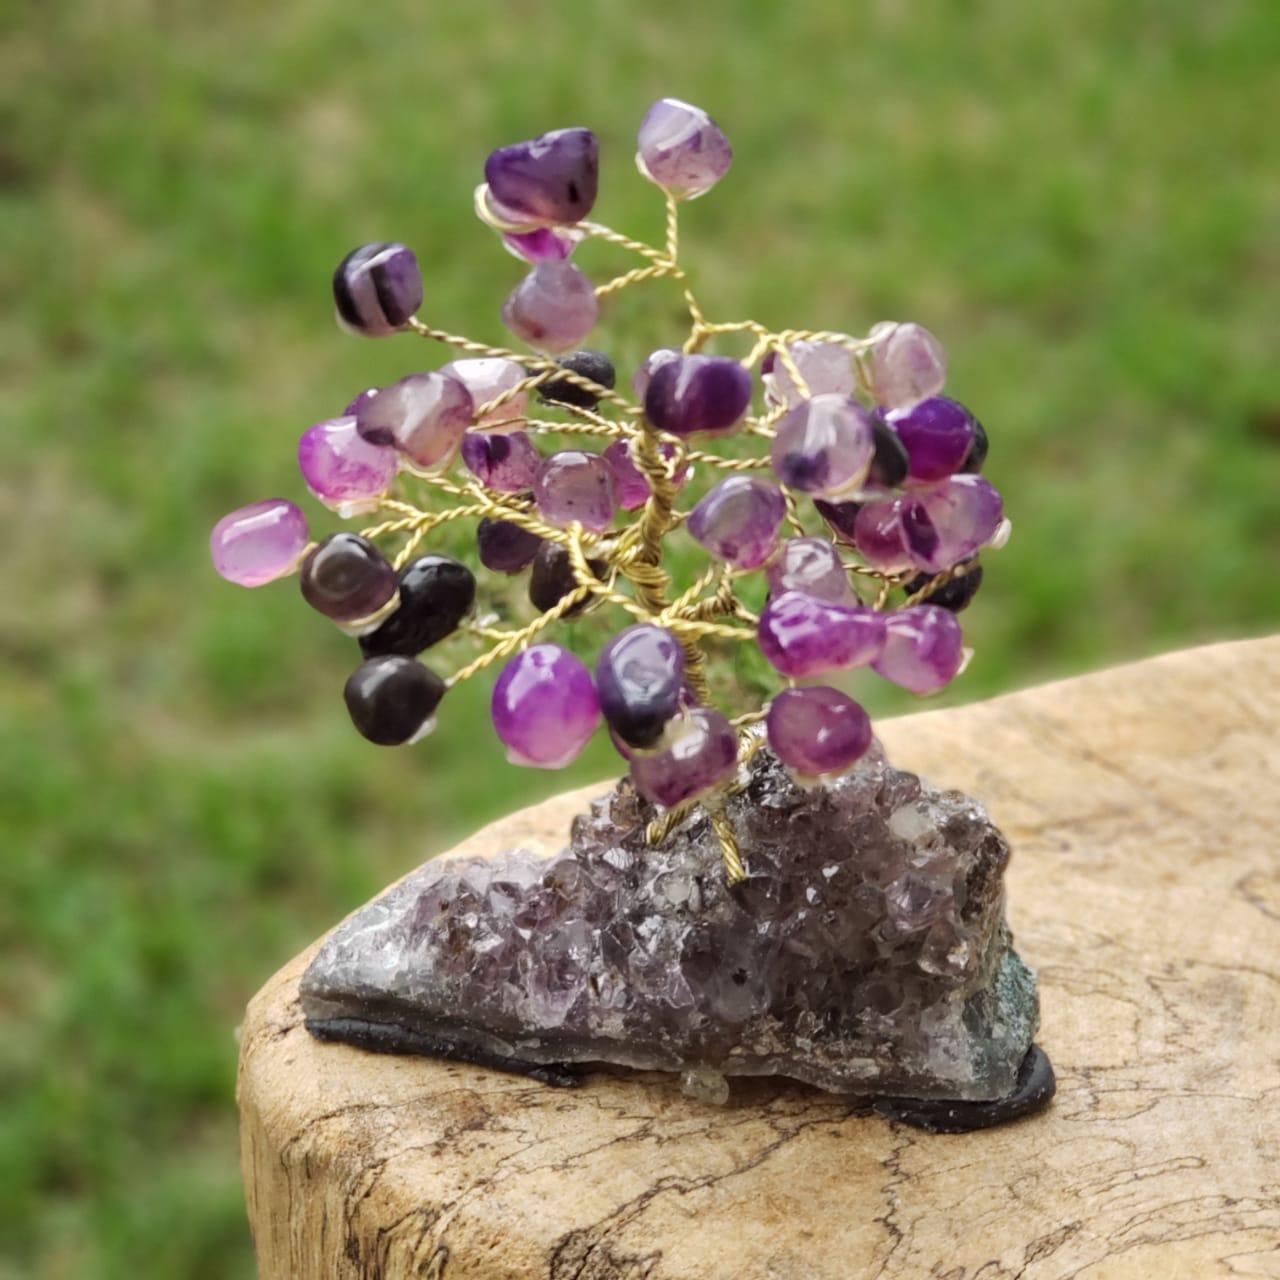 Cristal - Árvore Bonsai de Ametista e Ágatas